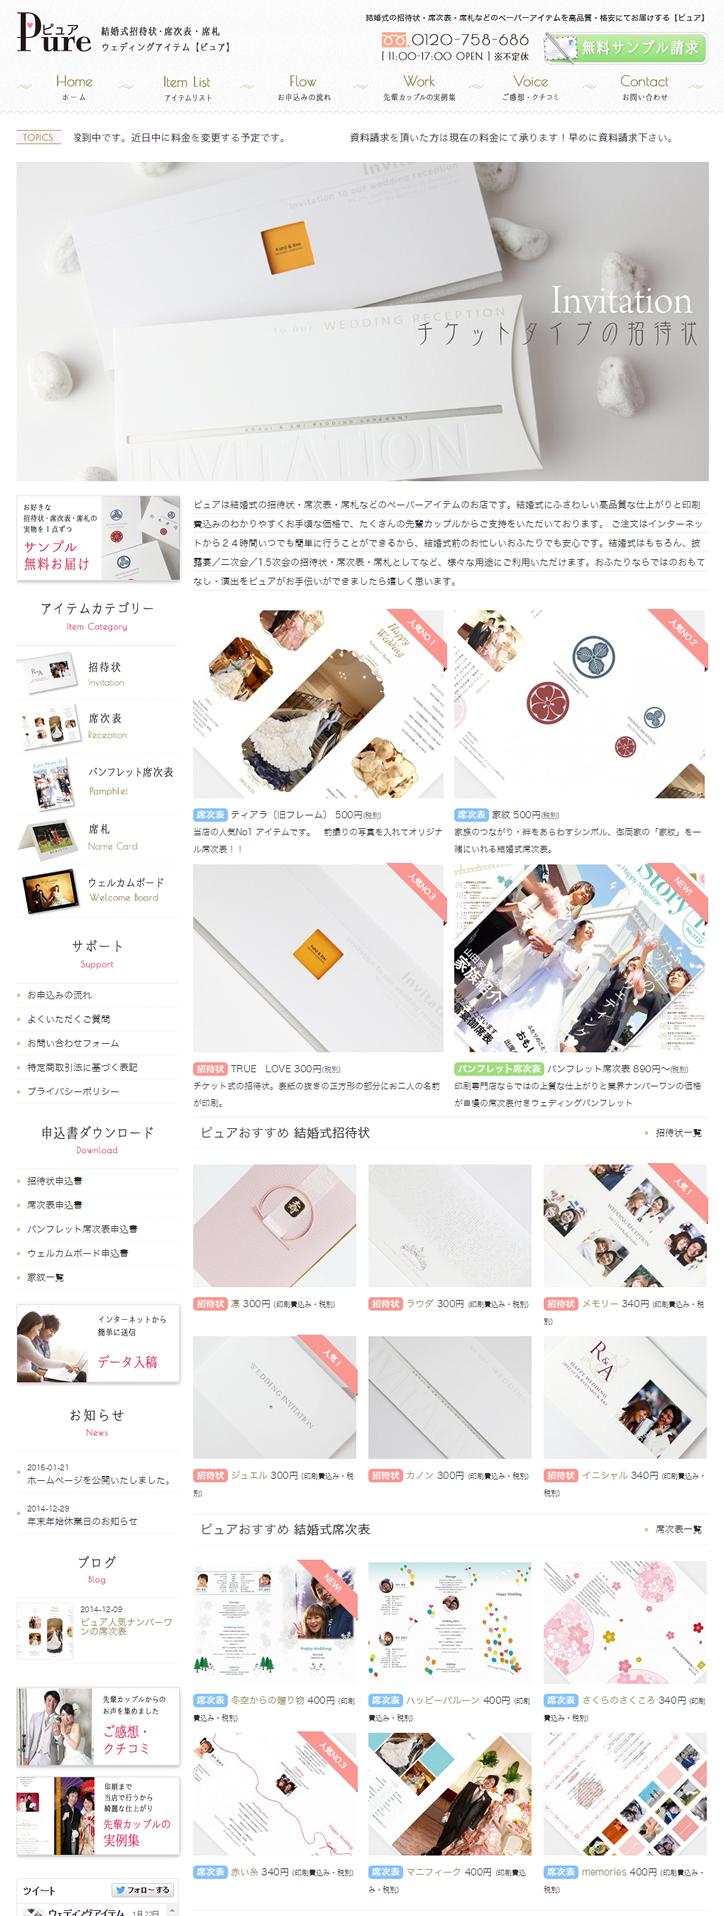 short_結婚式招待状・席次表の印刷専門店 ウエディングアイテム【ピュア】